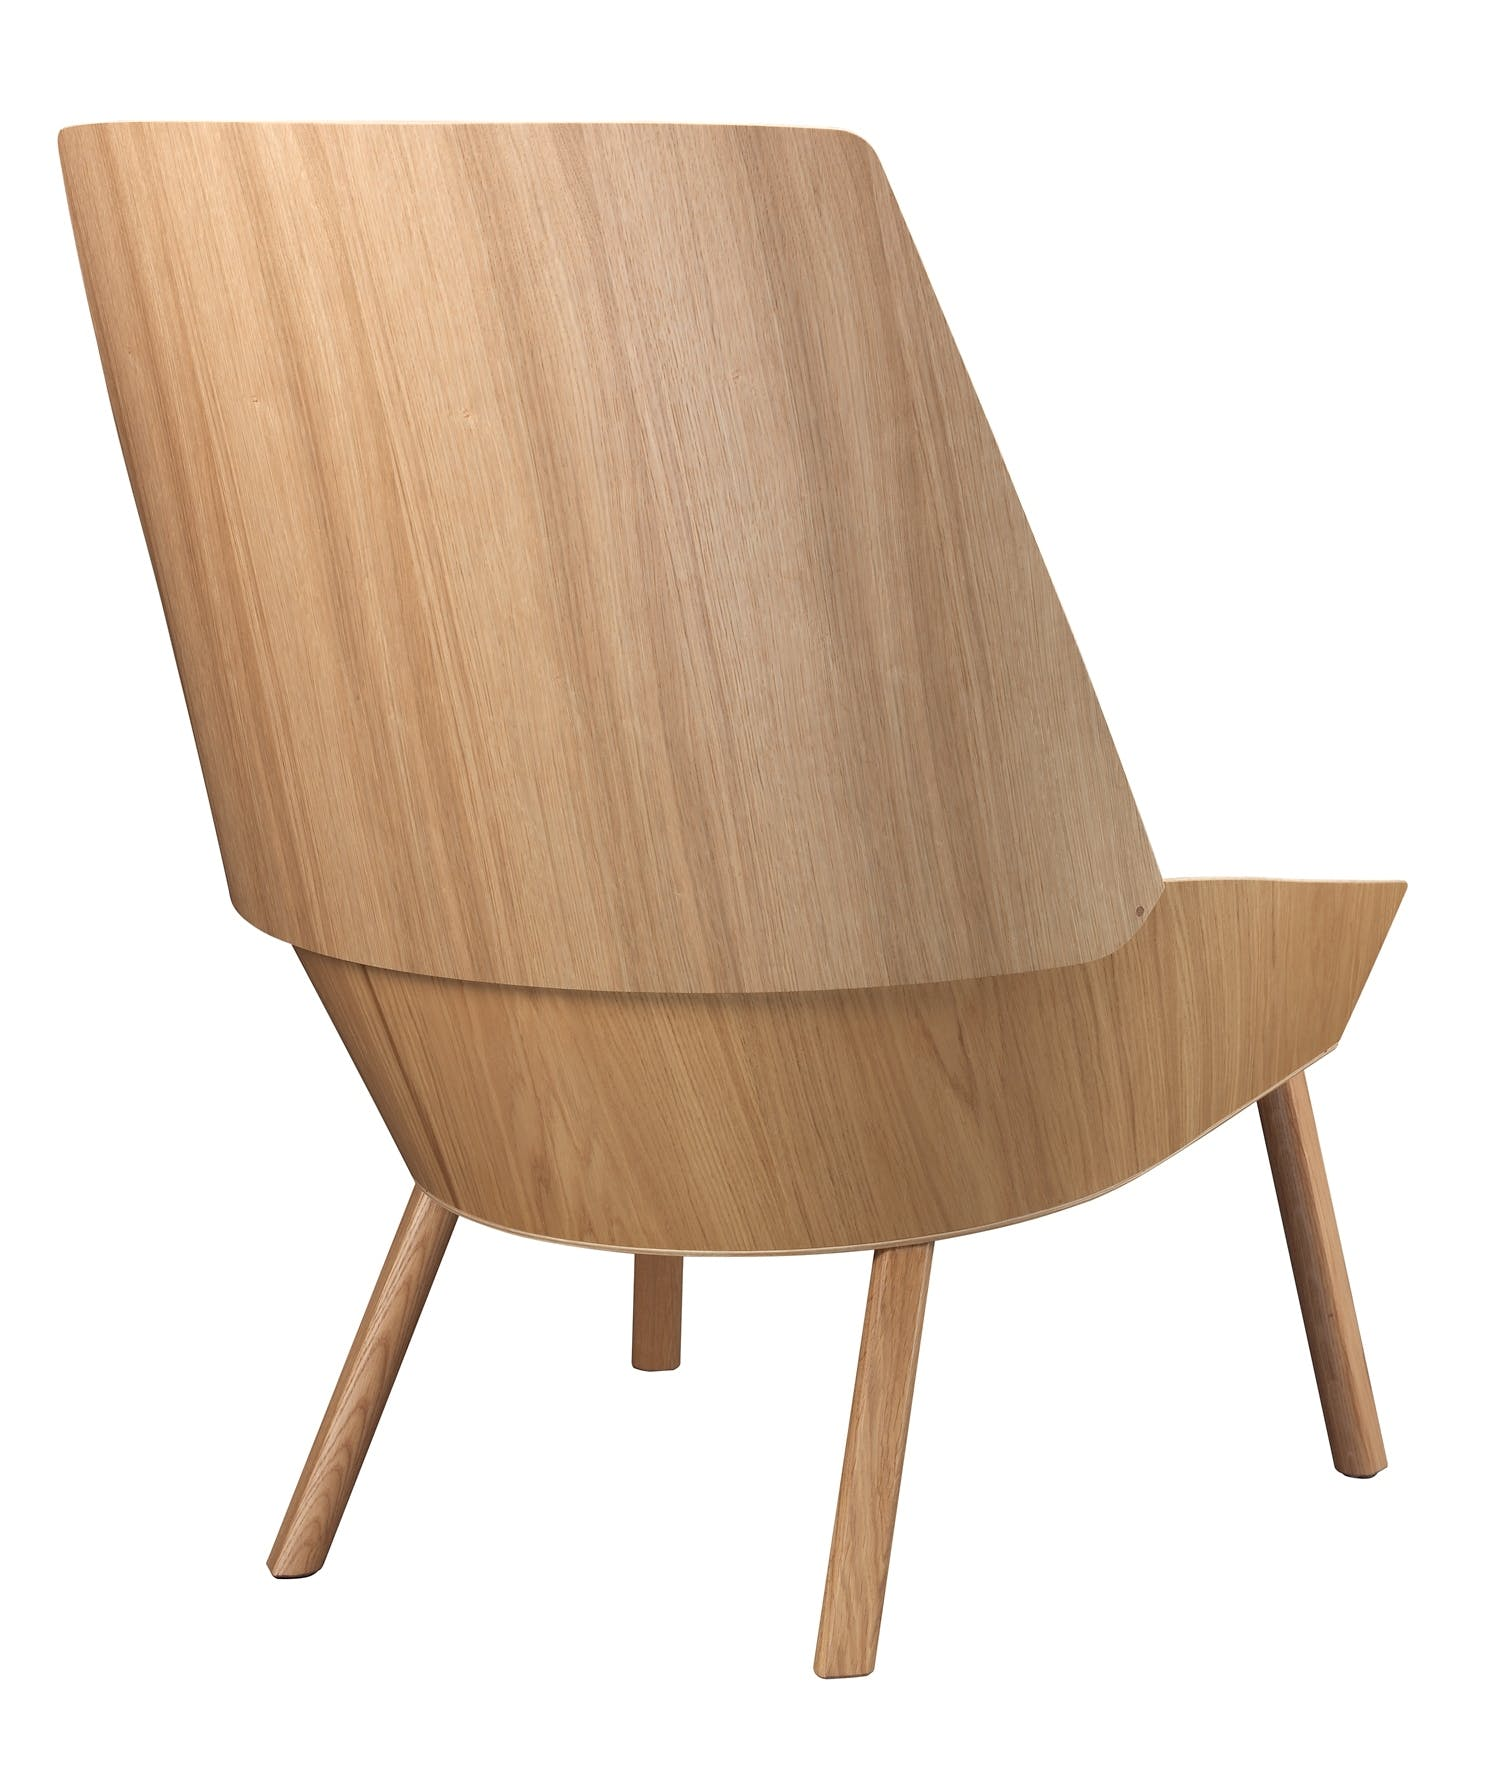 E15-furniture-back-euegne-chair-haute-living